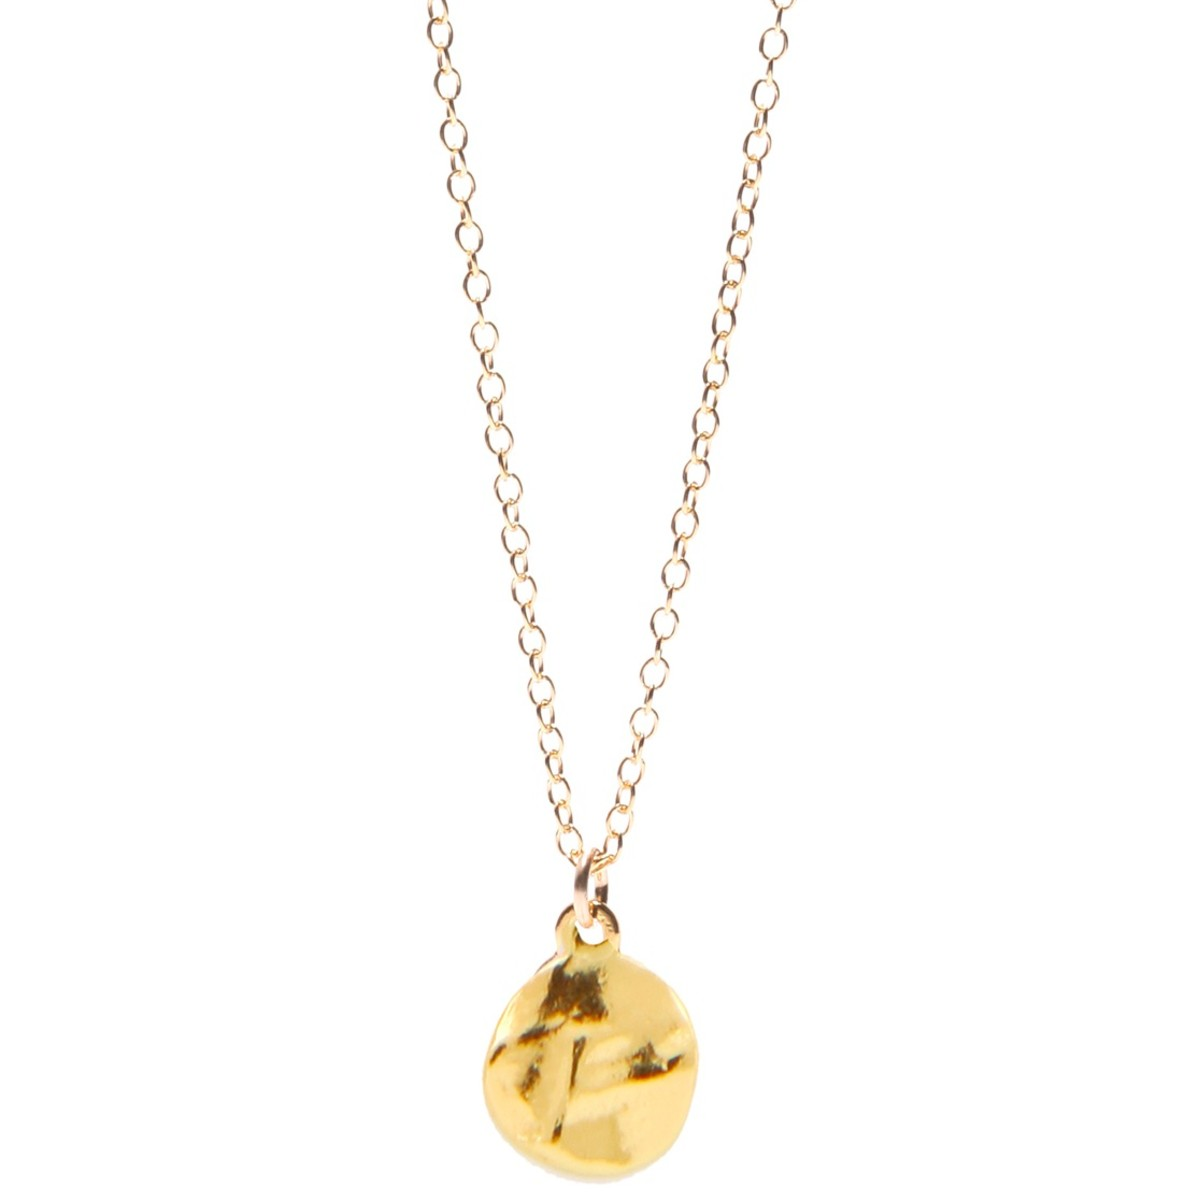 gorjana necklace.jpg